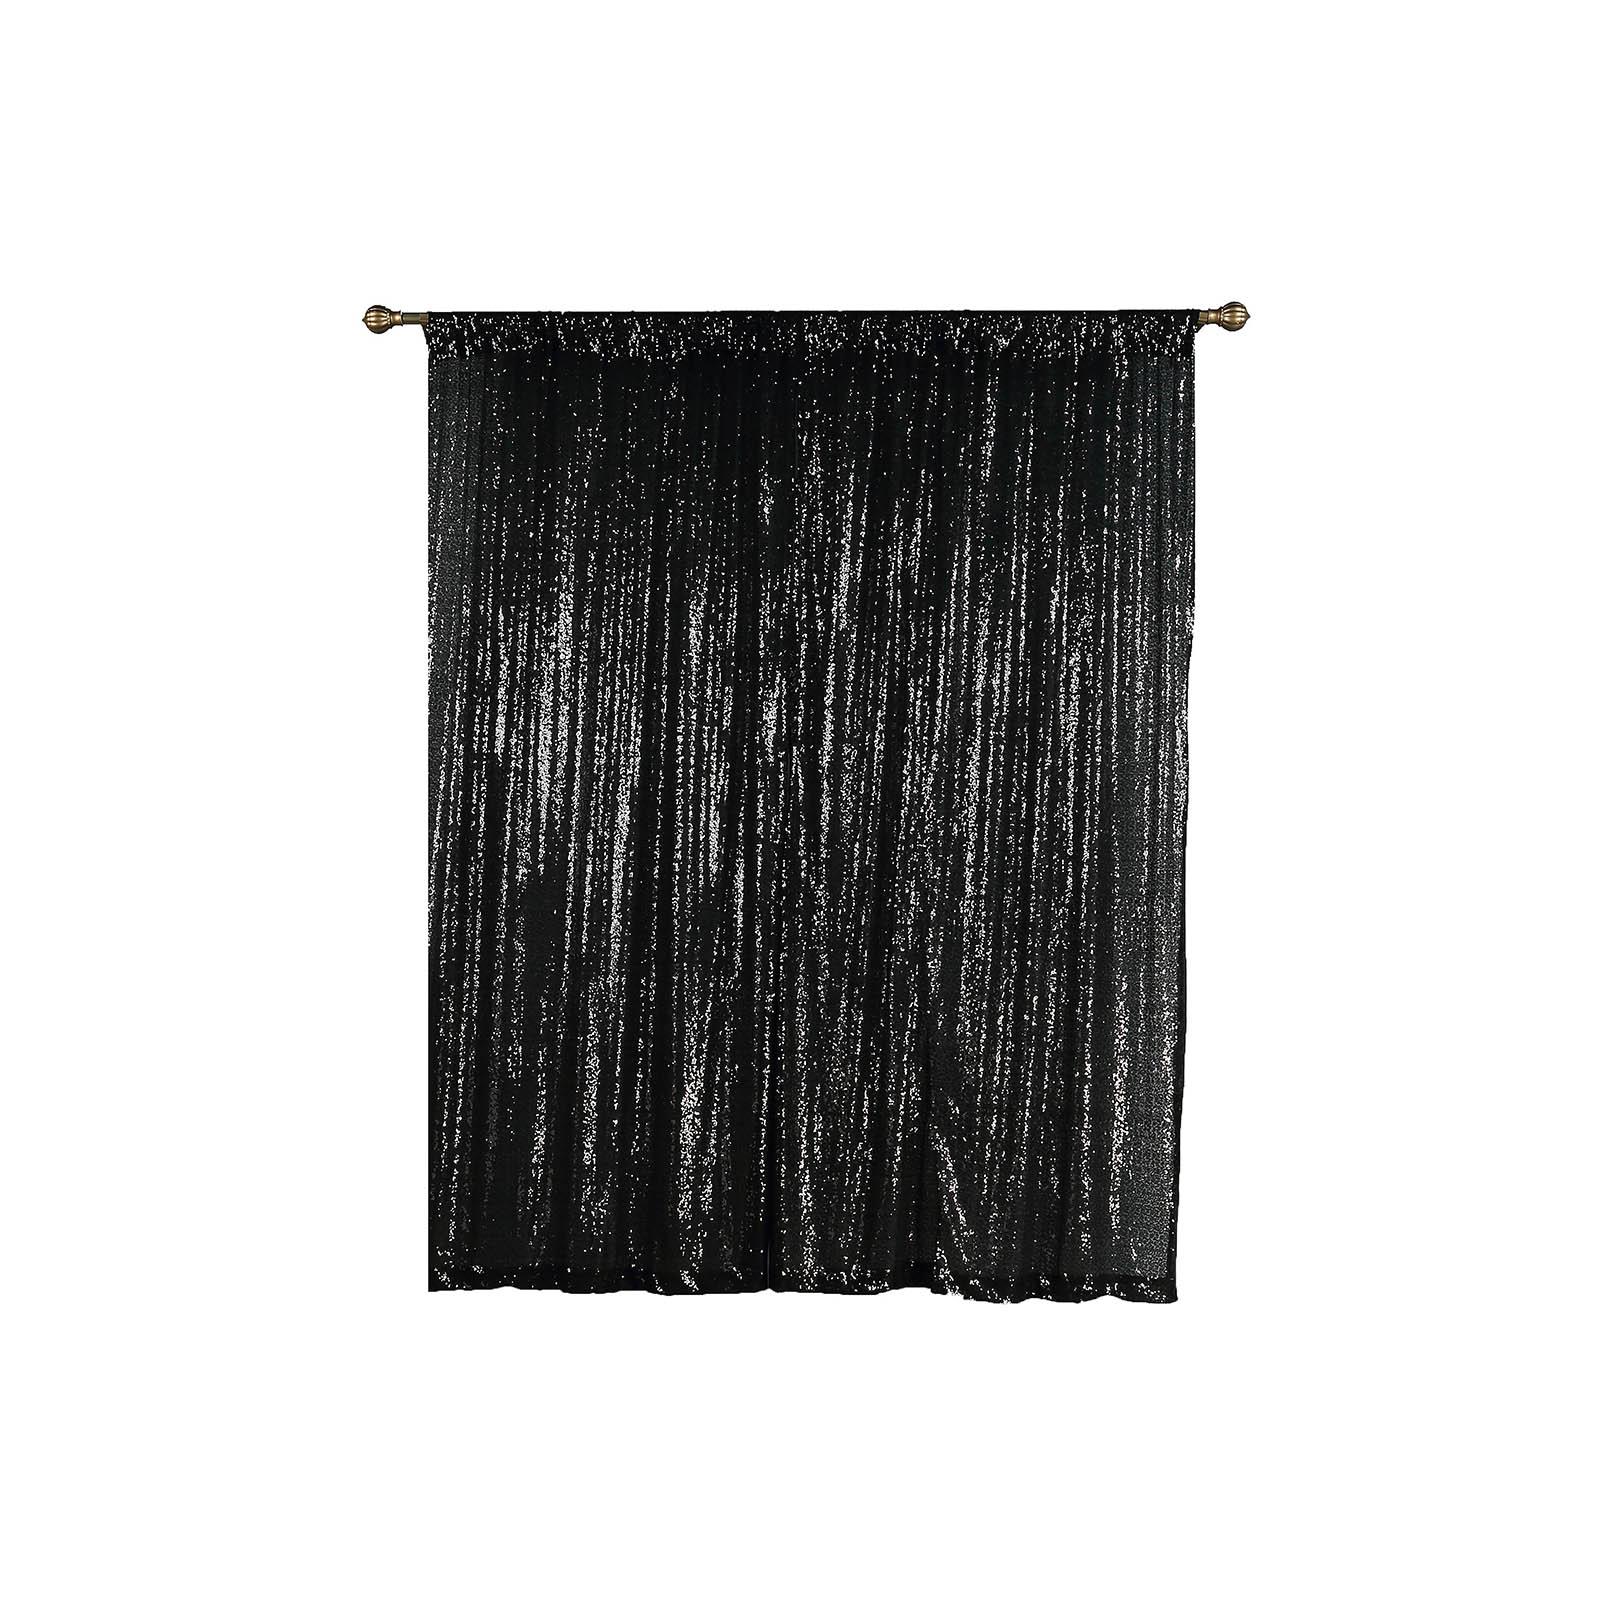 4-pcs-52-034-x-84-034-Sequined-Window-Curtains-Drapes-Panels-Backdrop-Home-Party-Decor thumbnail 4